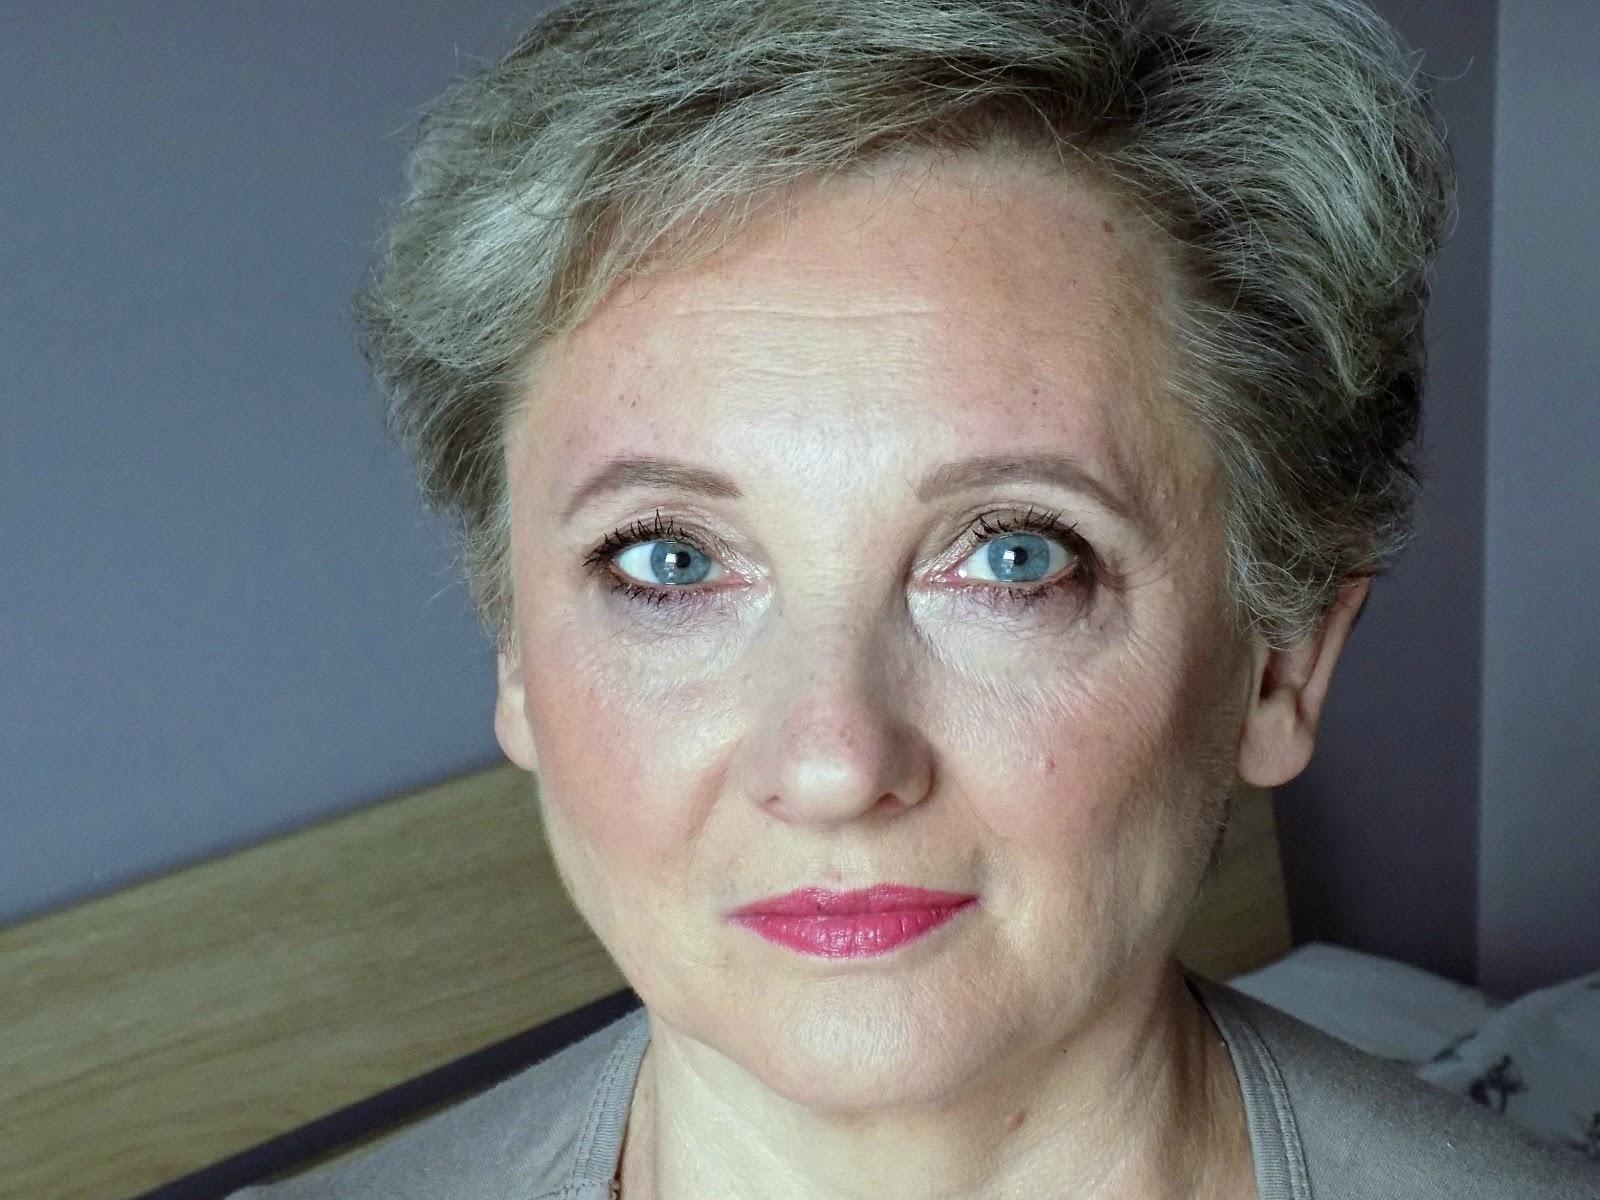 Makeup makeover: daytime glam for mature skin